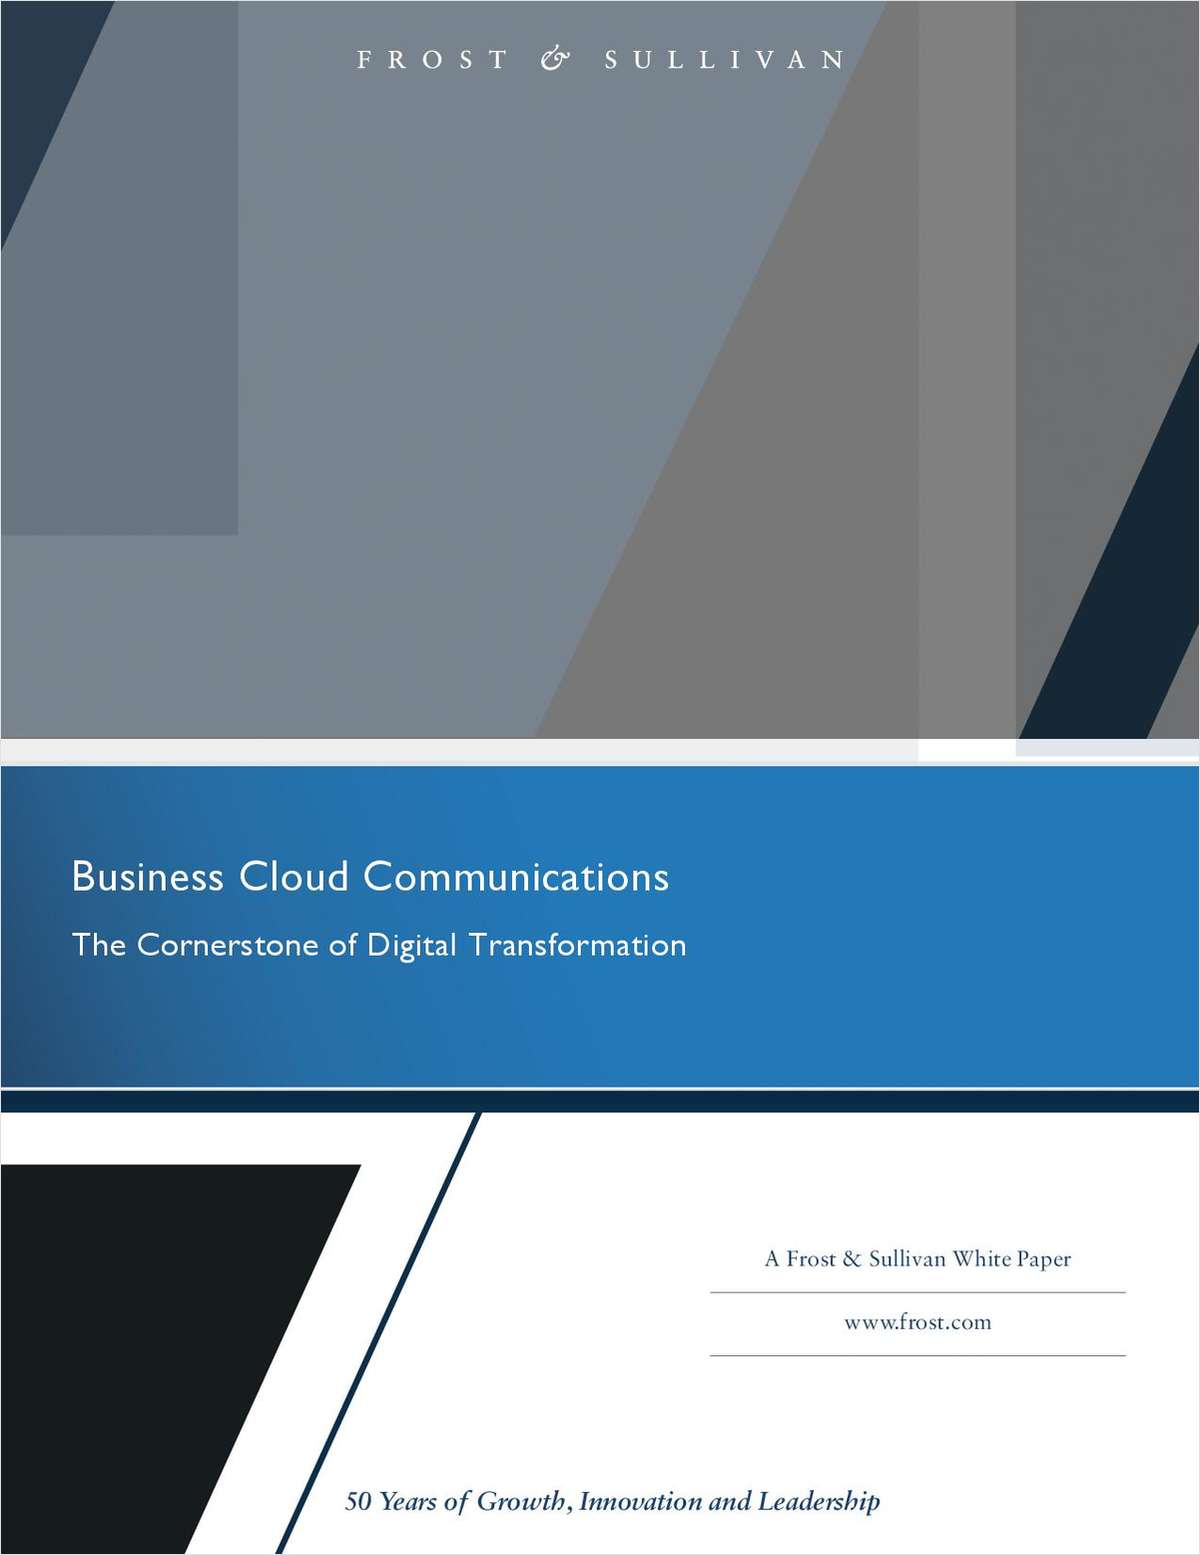 Business Cloud Communications: The Cornerstone of Digital Transformation